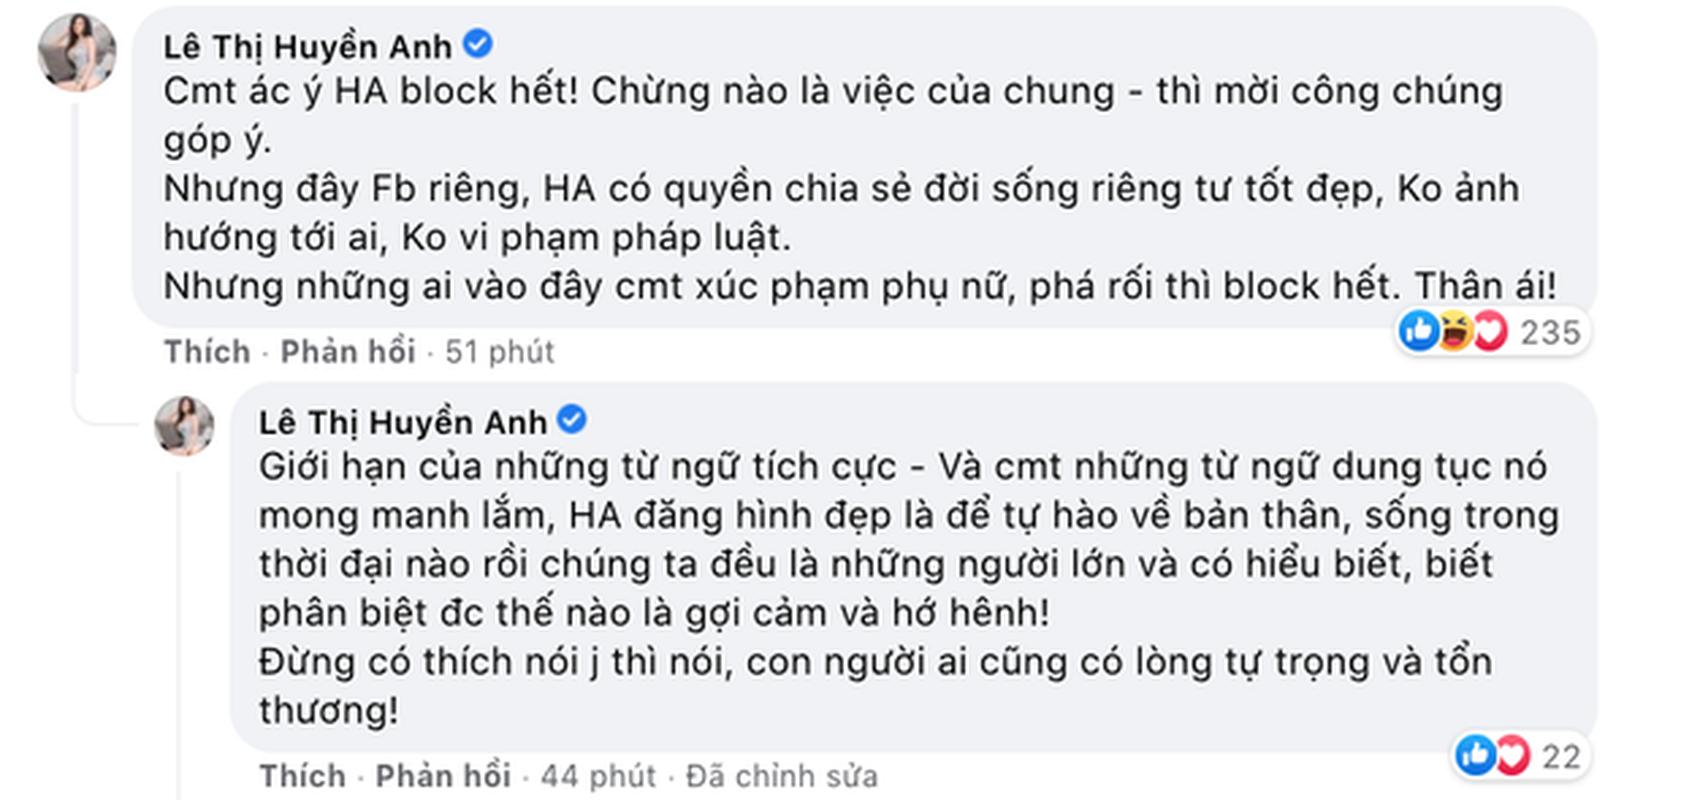 Ba Tung phat ngon cung danh cho nhung antifan thich soi moi-Hinh-5